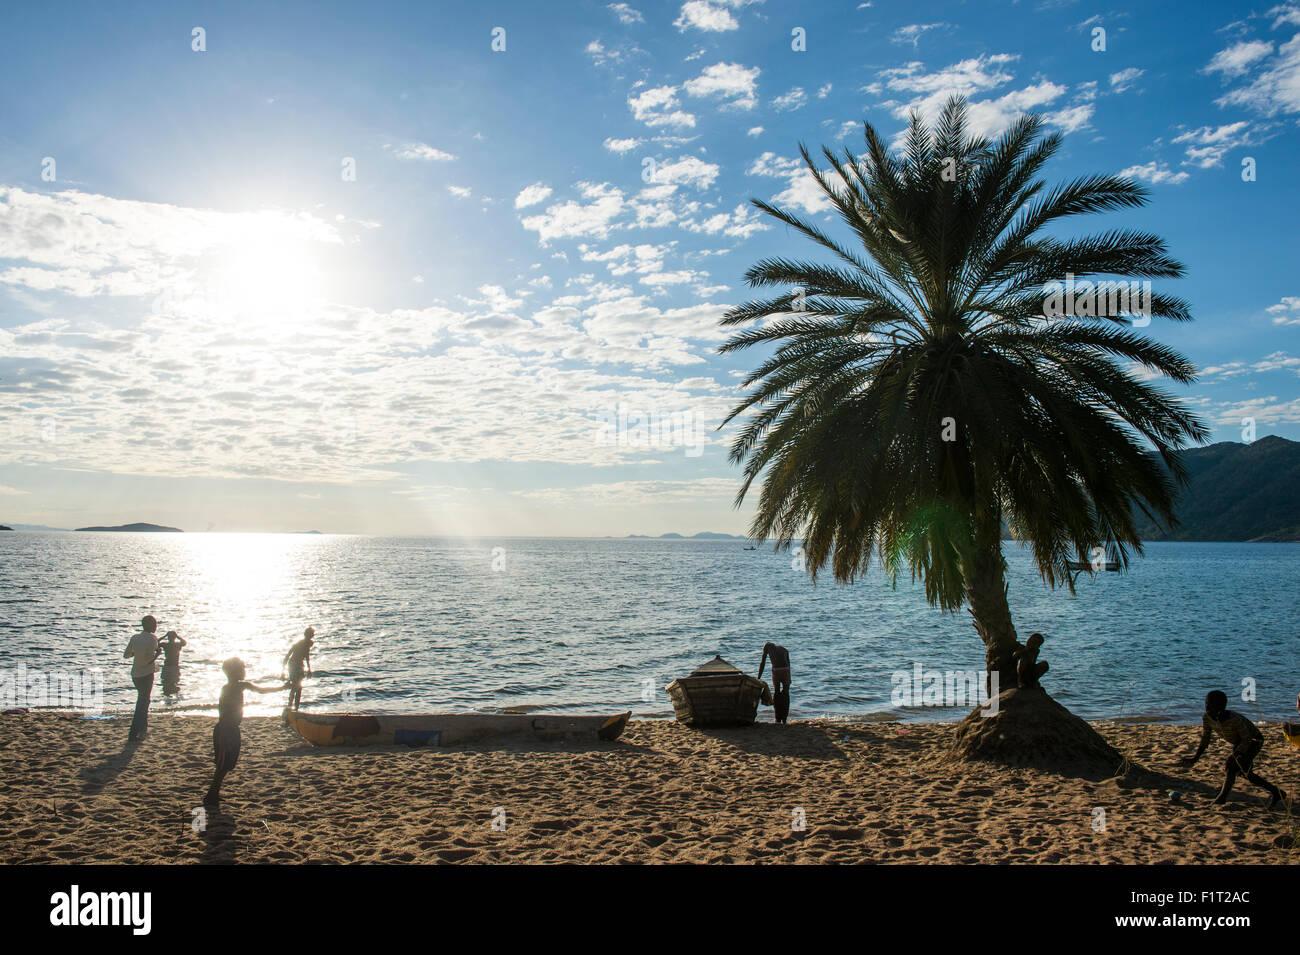 Hintergrundbeleuchtung des Cape Malcear, Lake Malawi, Malawi, Afrika Stockbild